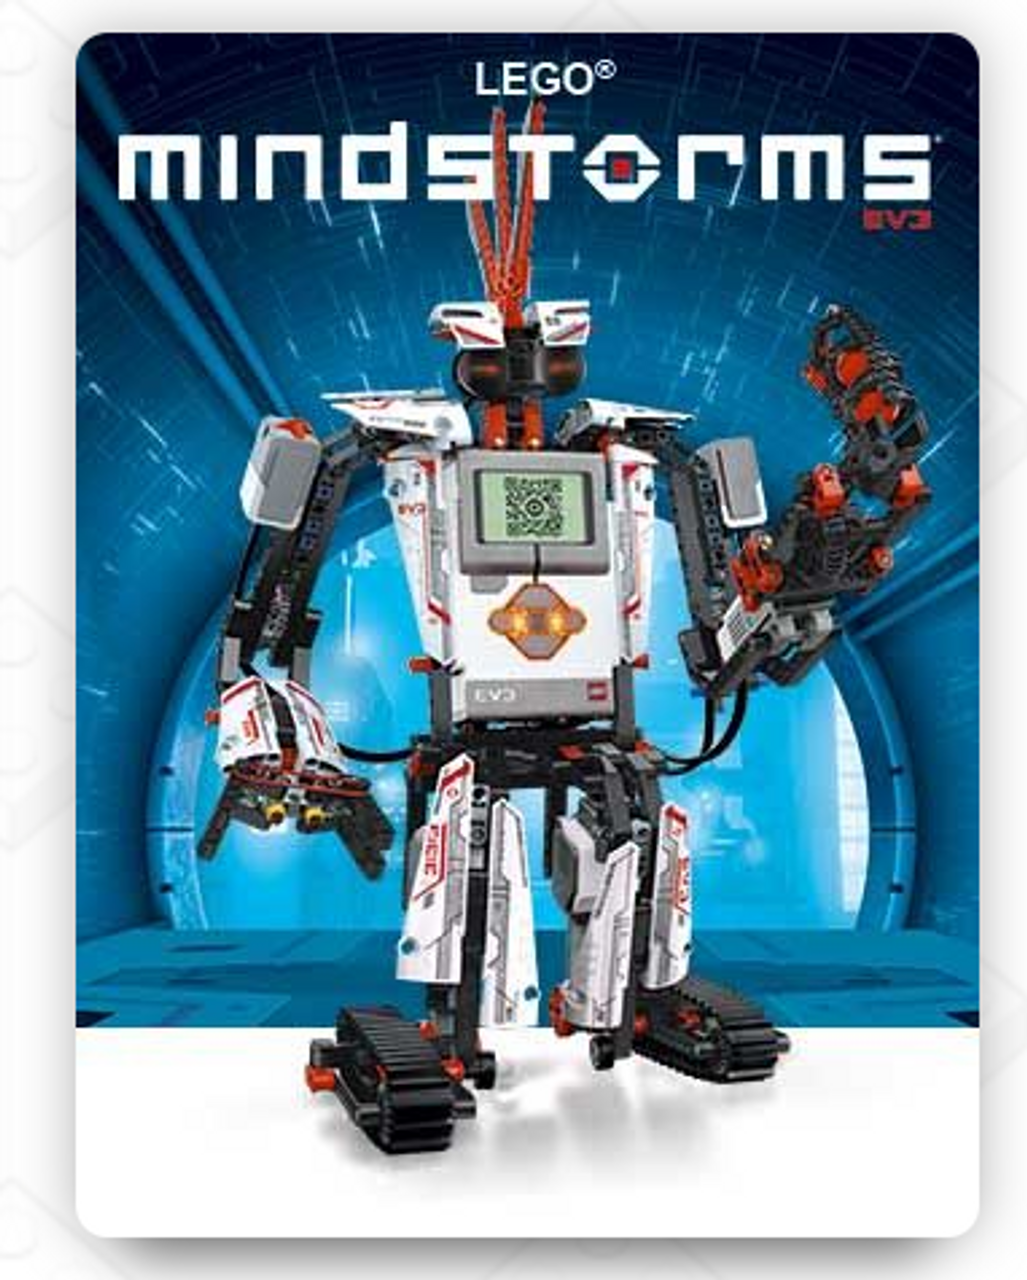 LEGO Mindstorms interactive robot Specialist in Australia